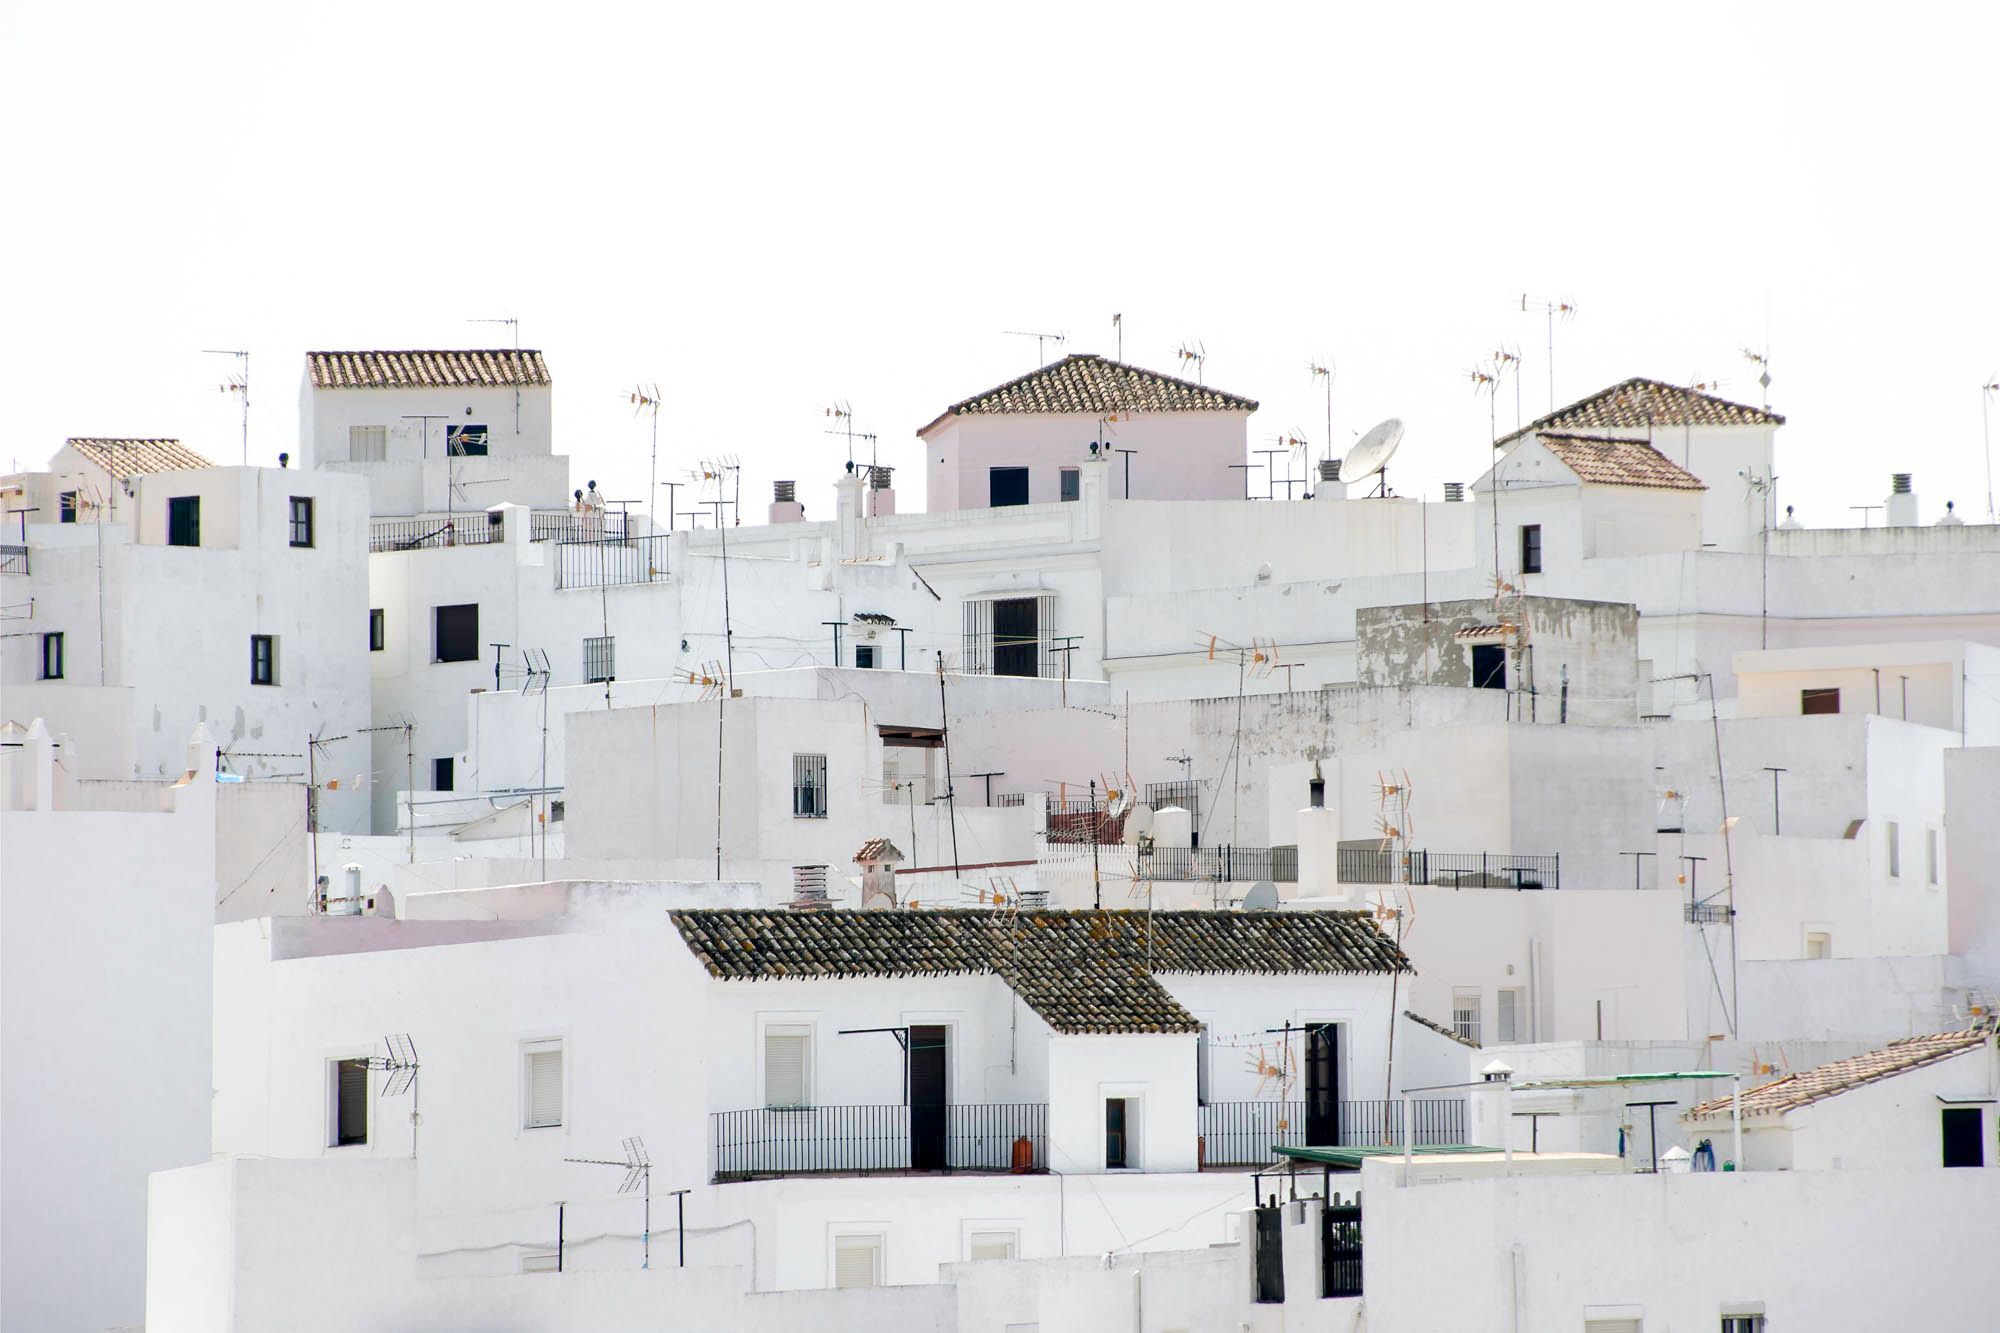 4-We Live here-Vejer, Spain.jpg